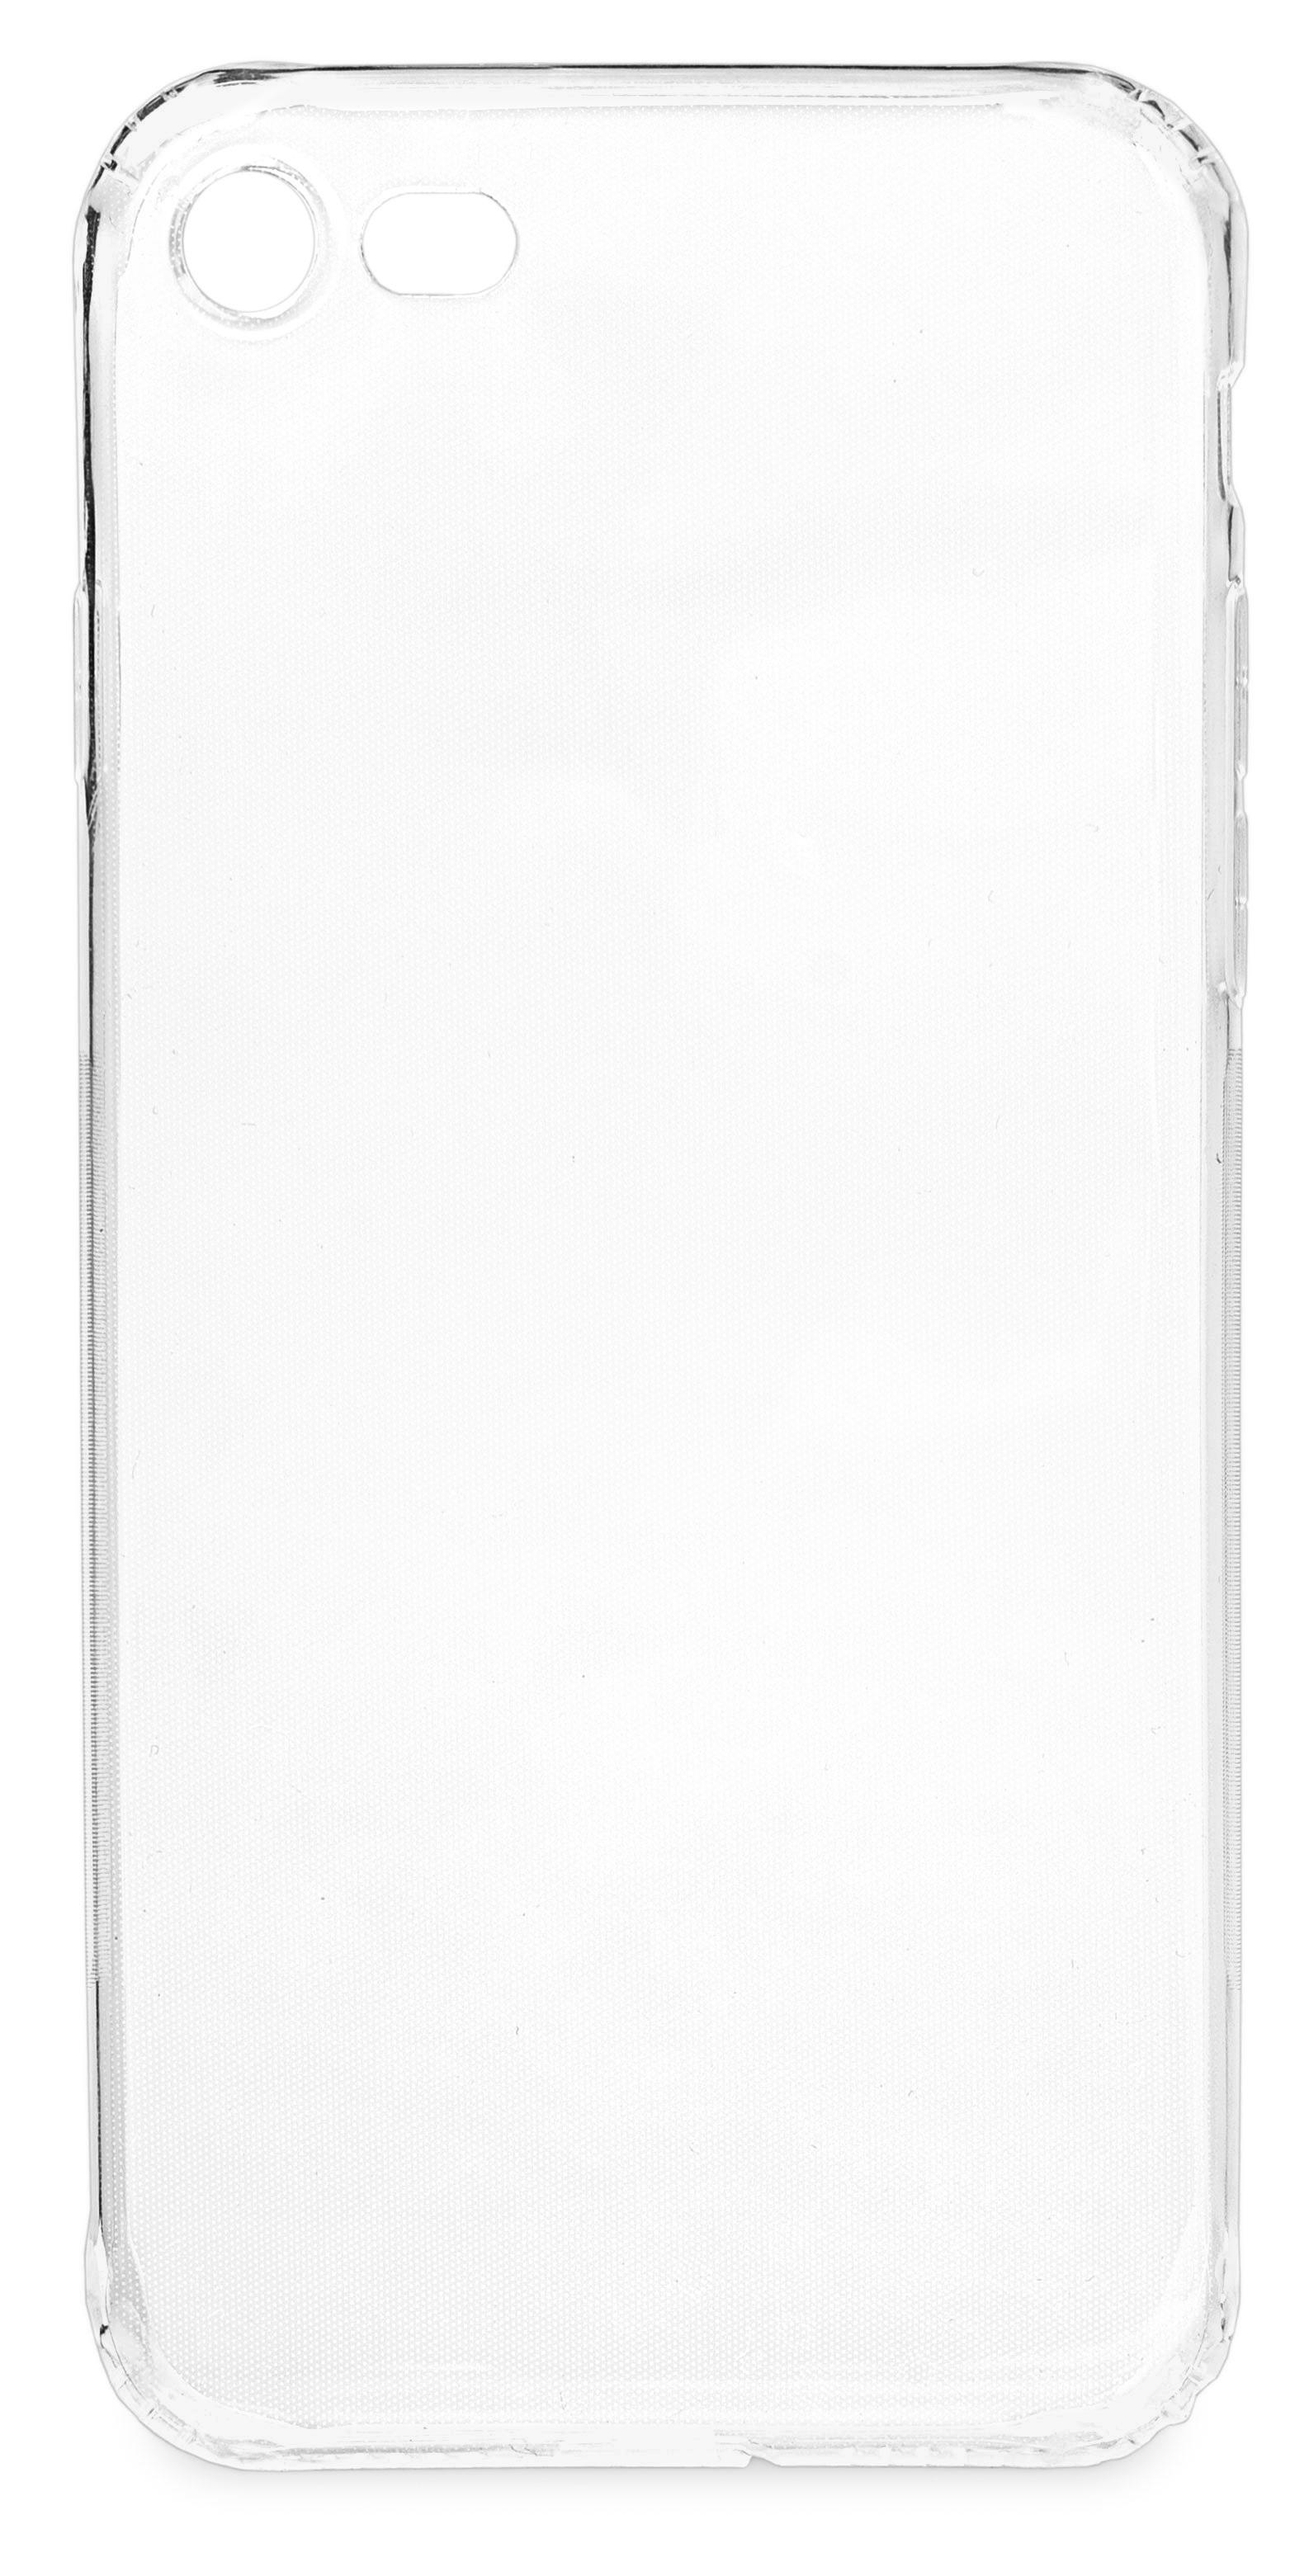 Чехол-накладка Skinbox Skinbox Slim Silicone для для Apple iPhone 7/8, 4660041405934 цена и фото